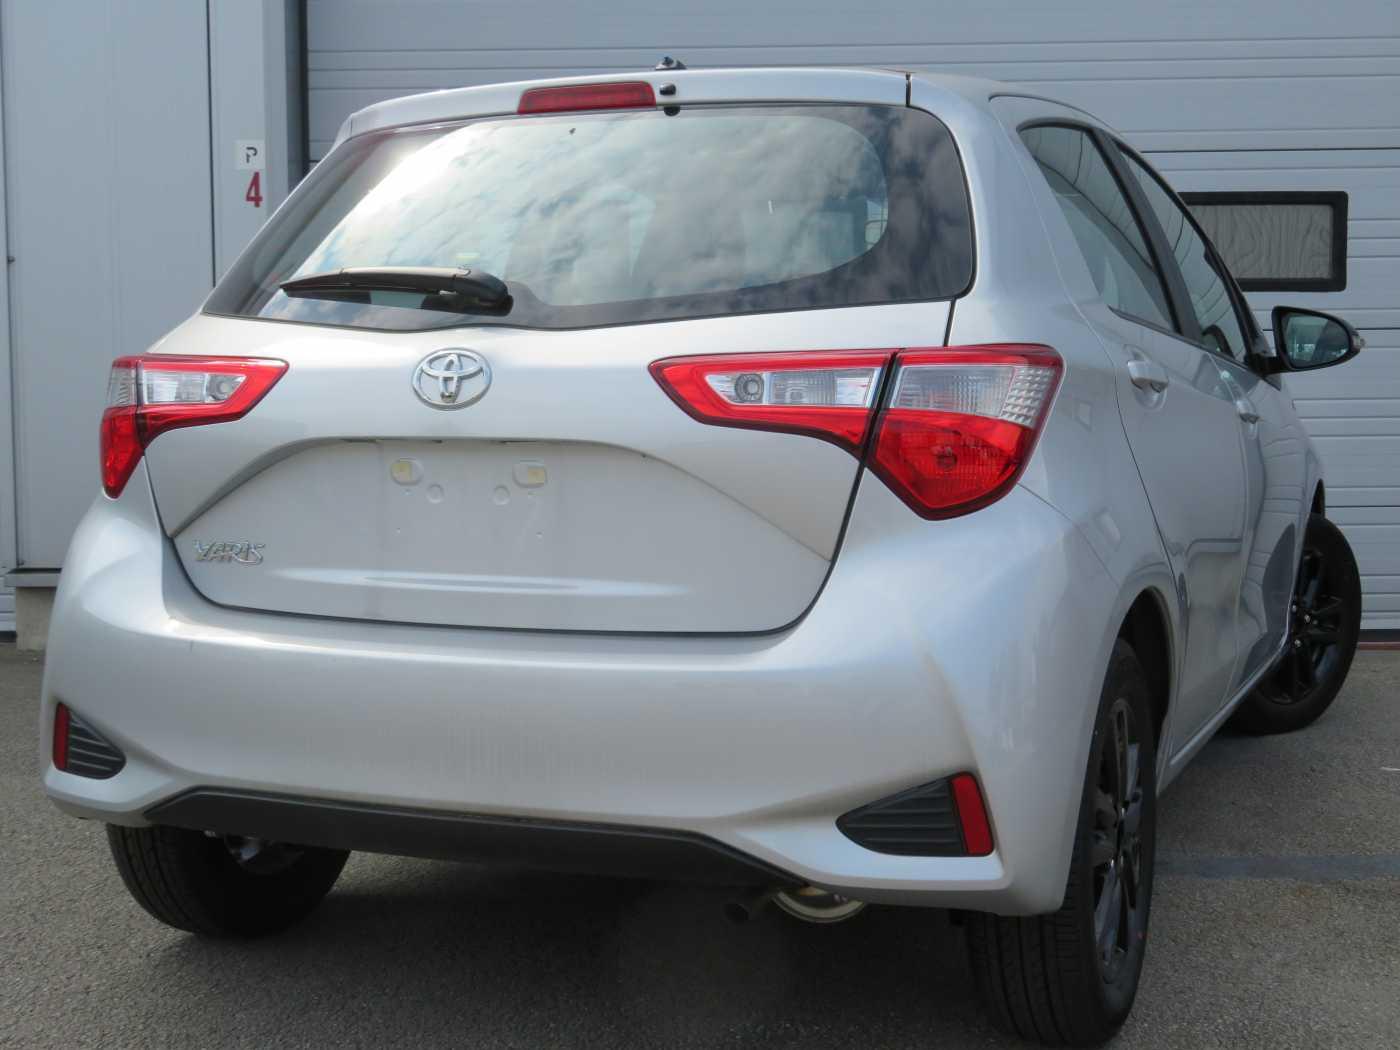 Toyota Yaris 1.0L 3/7